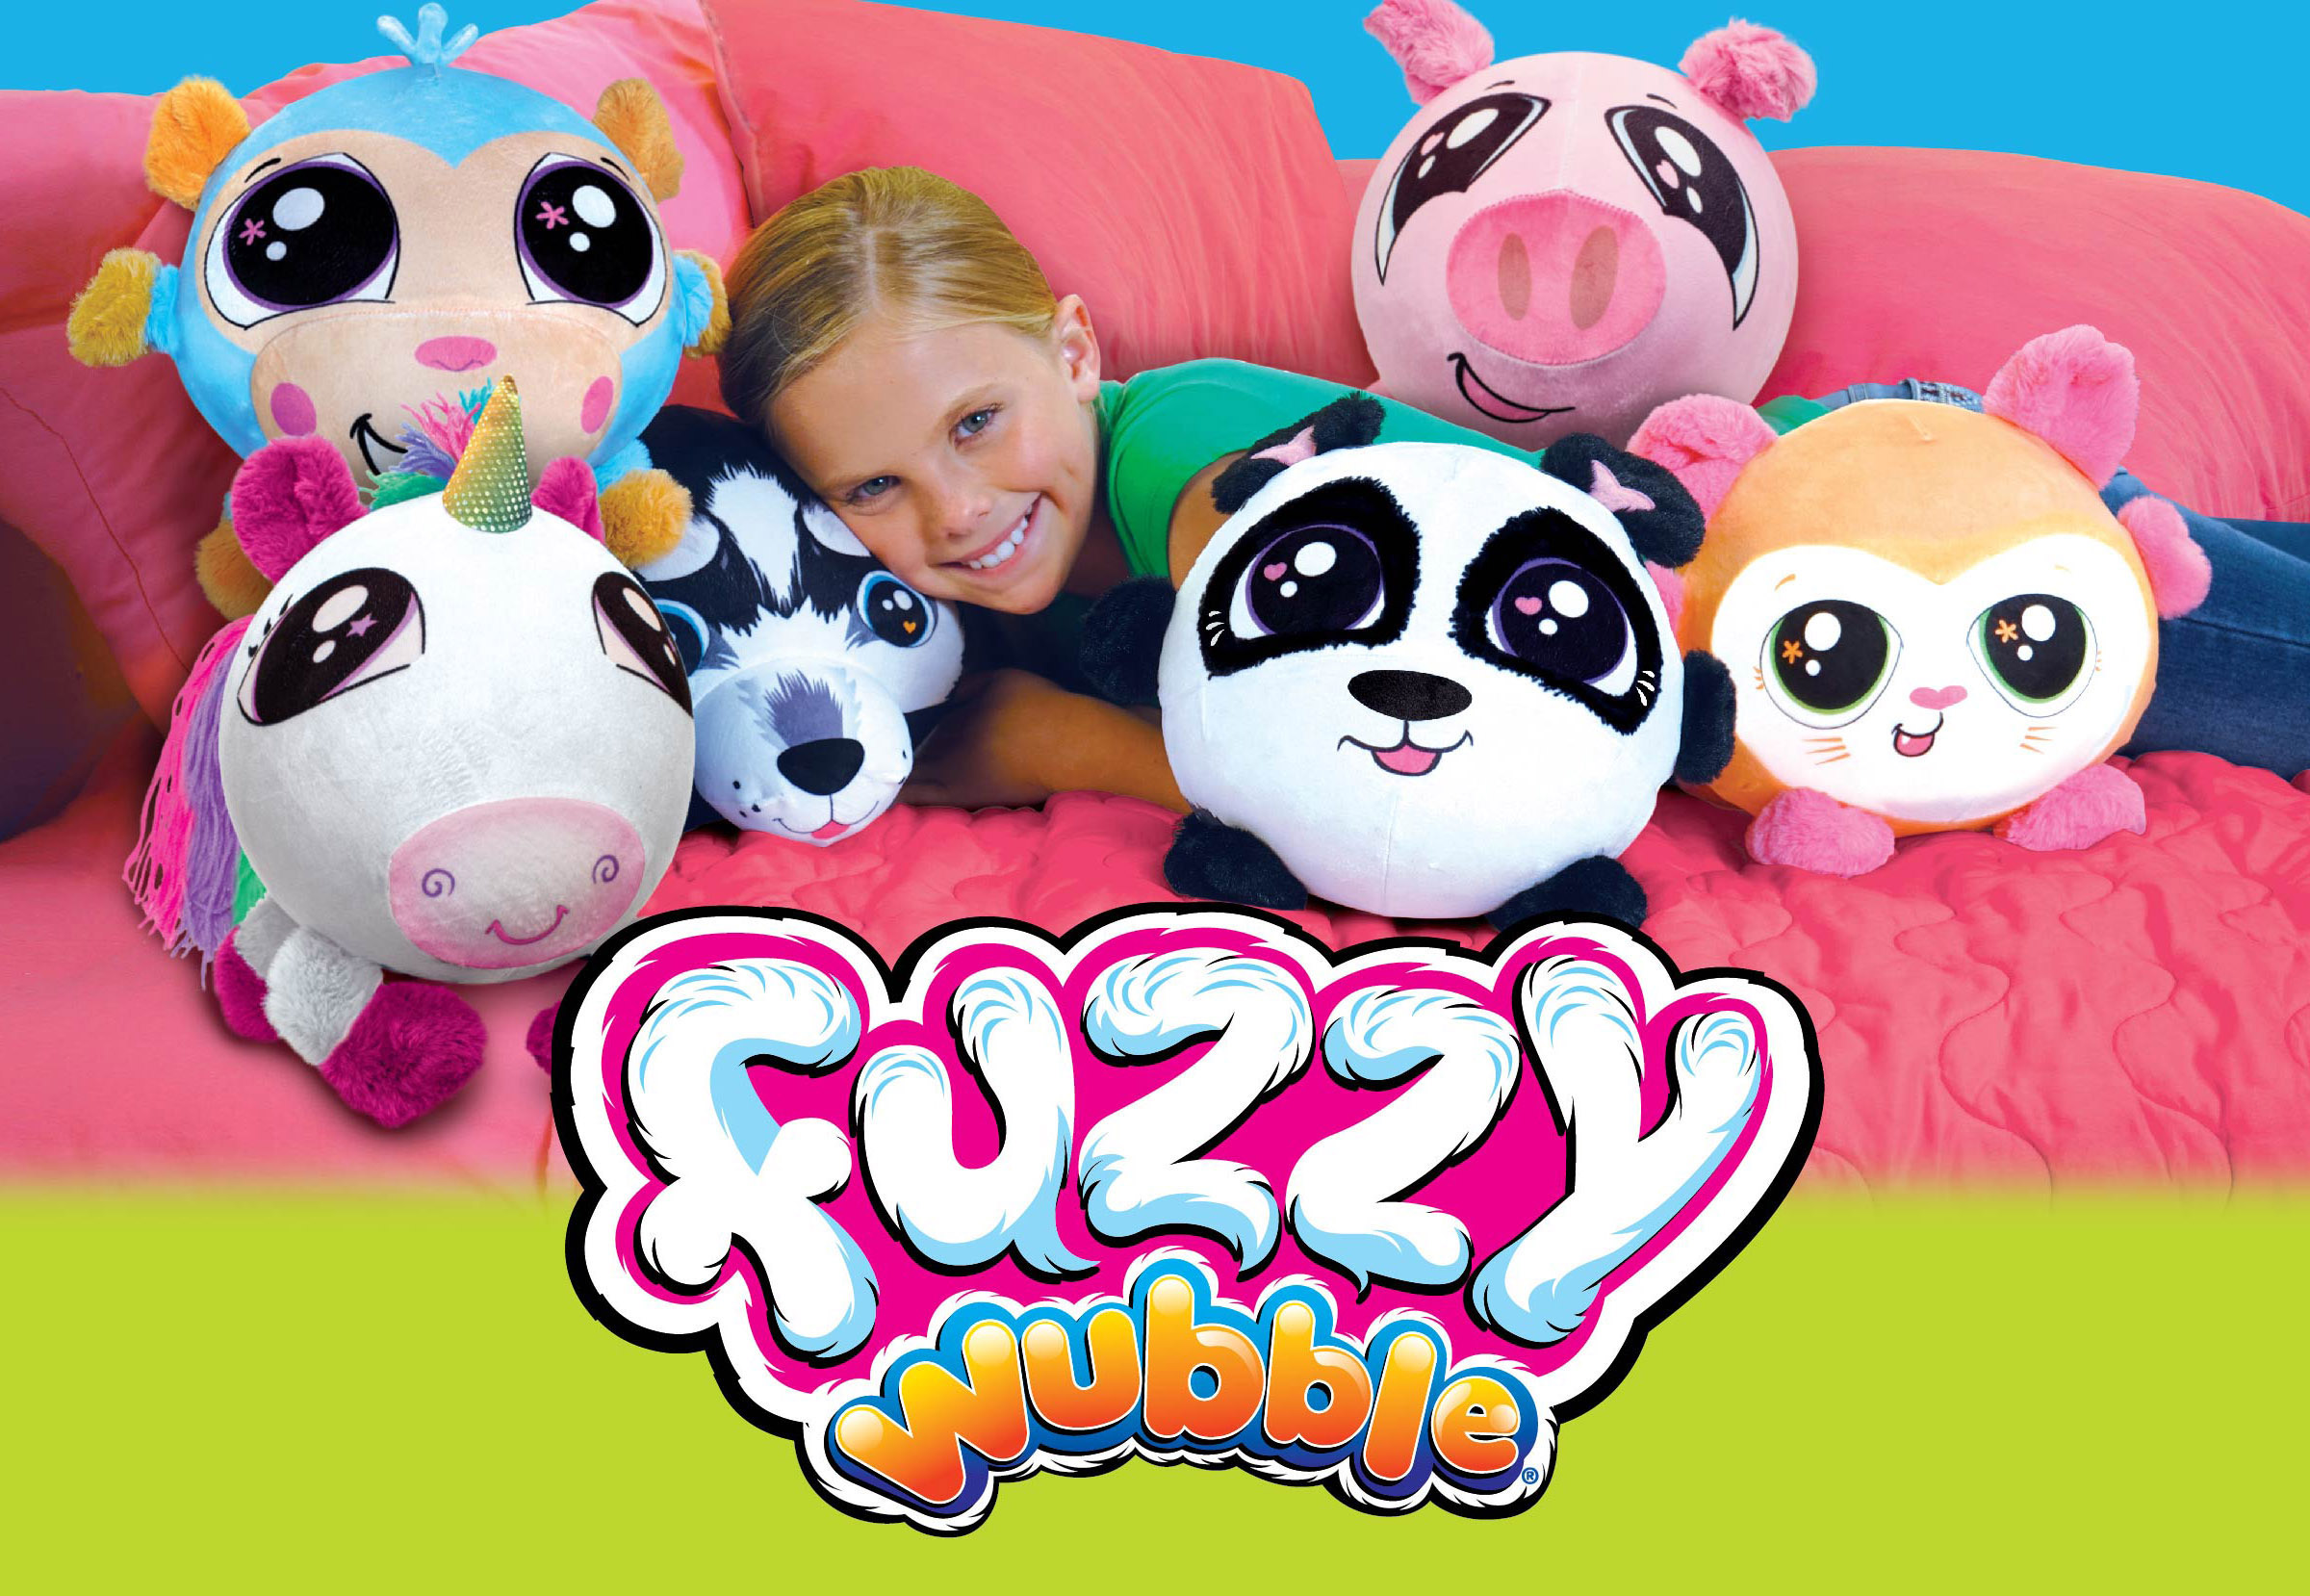 Fuzzy Wubble